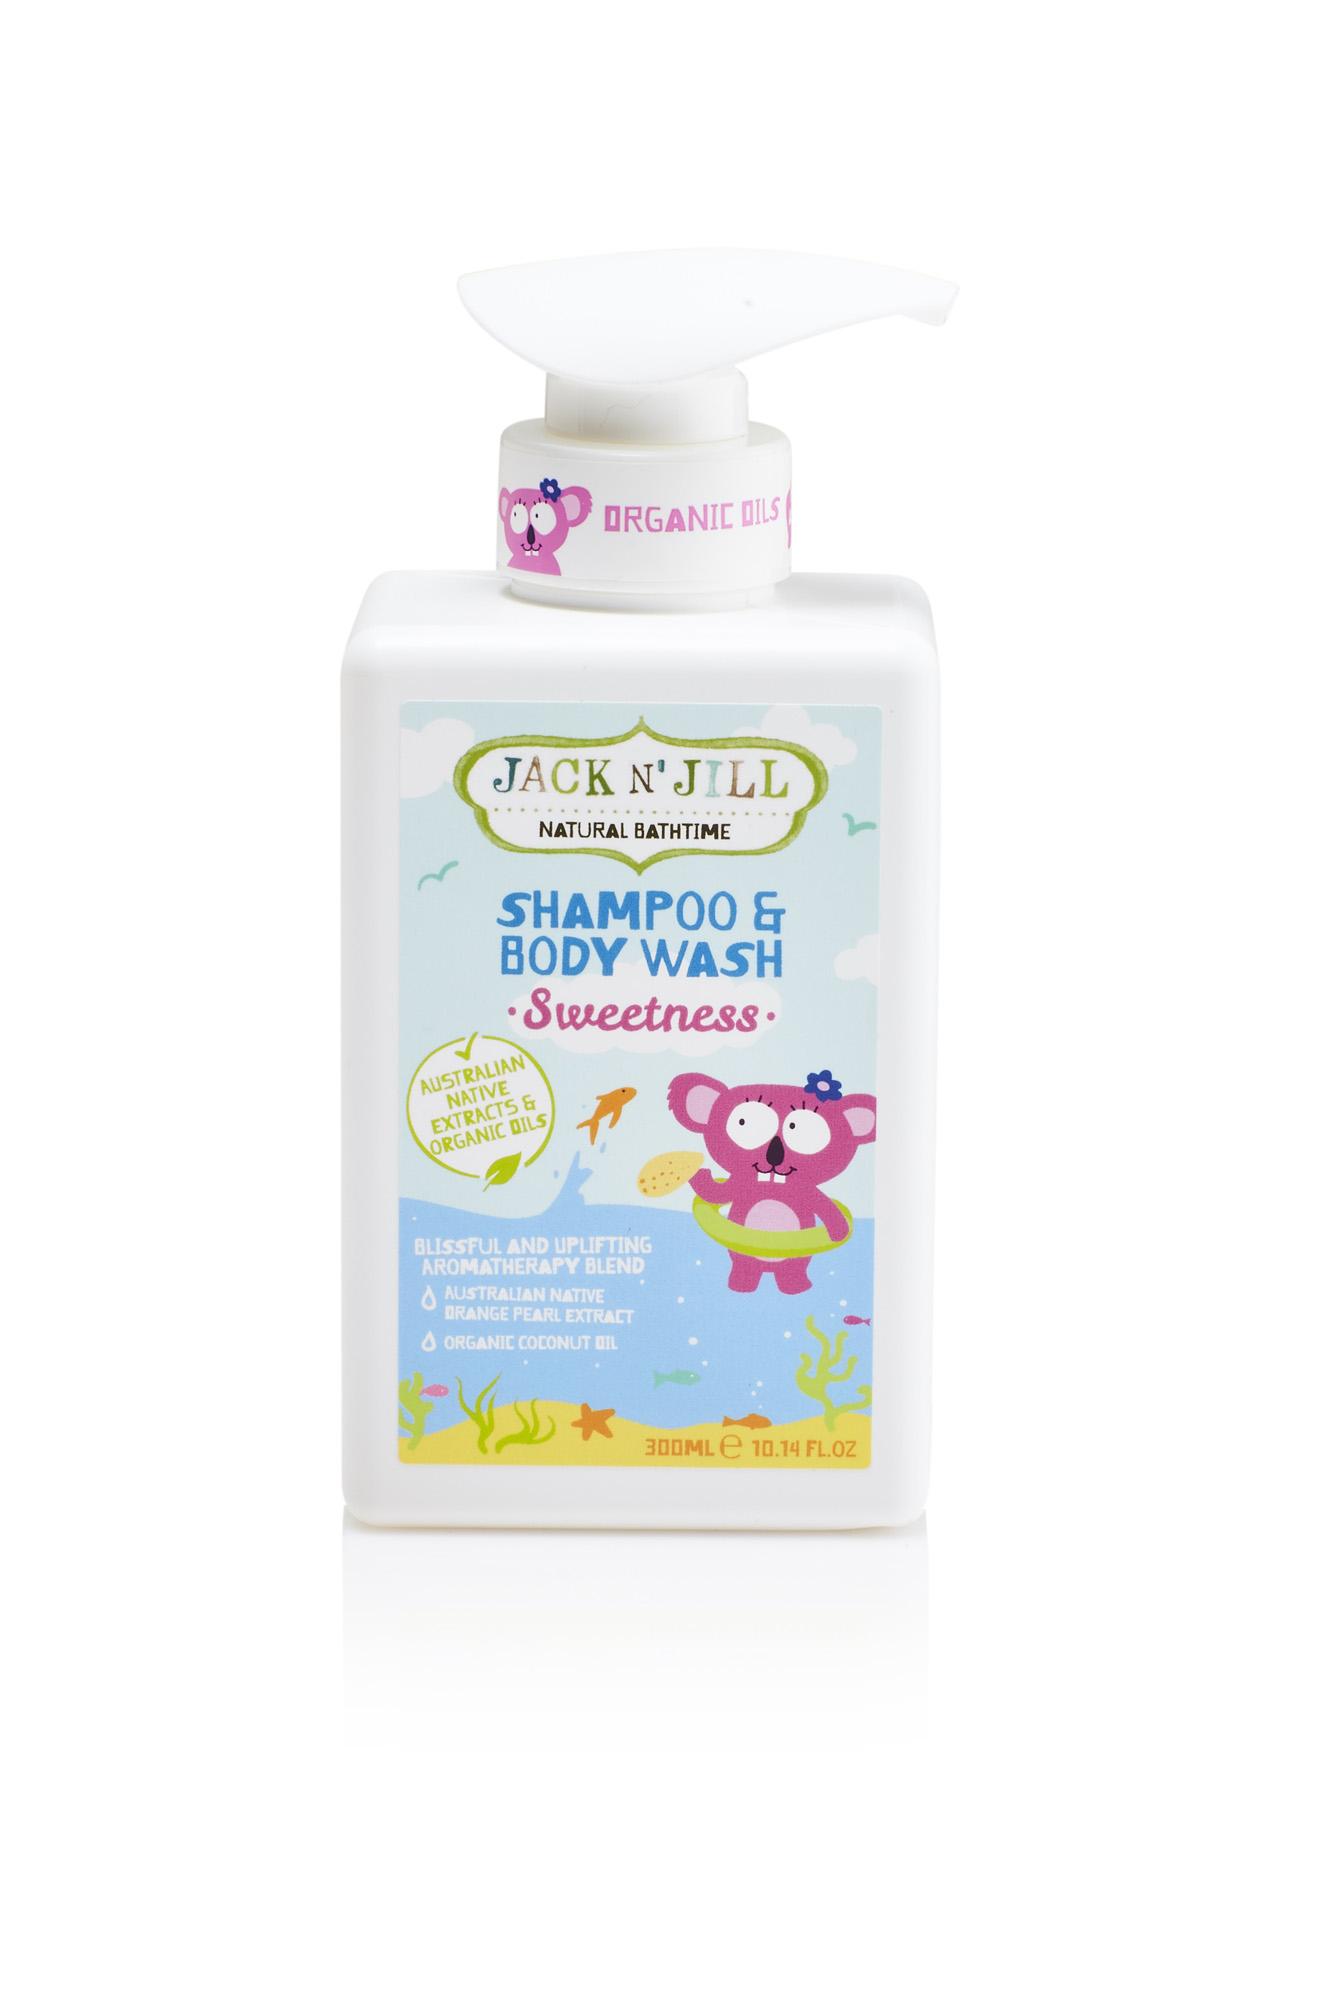 Jack N´ Jill NATURAL BATHTIME Sprchový gel a šampon, Sweetness